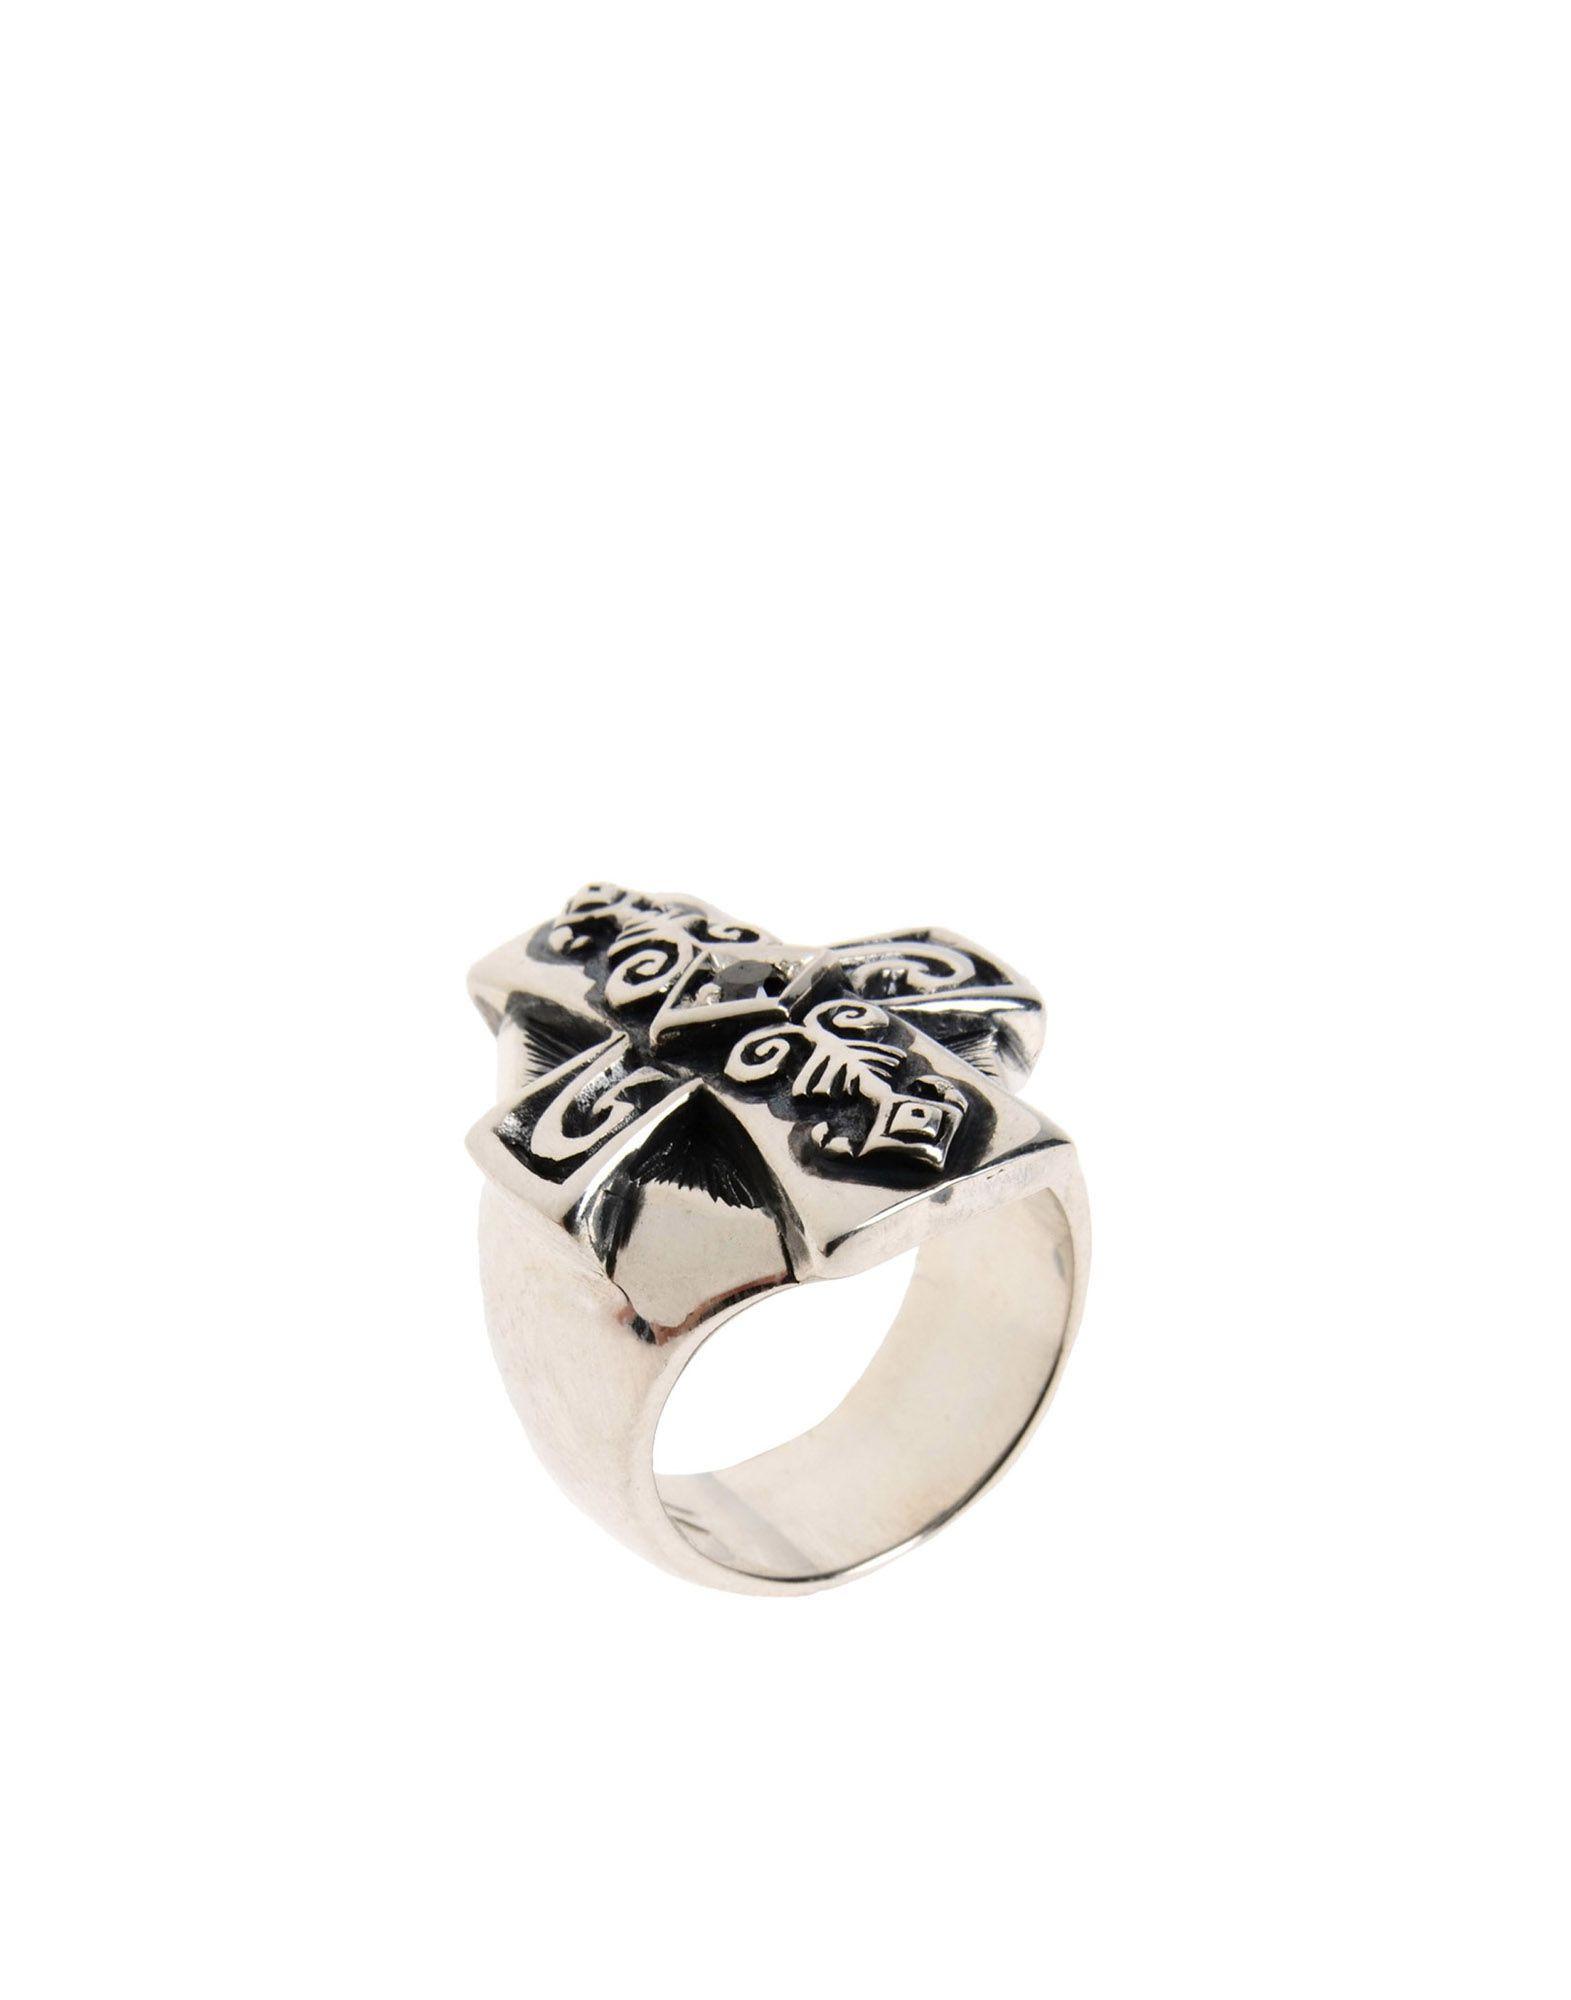 MANUEL BOZZI Ring in Silver